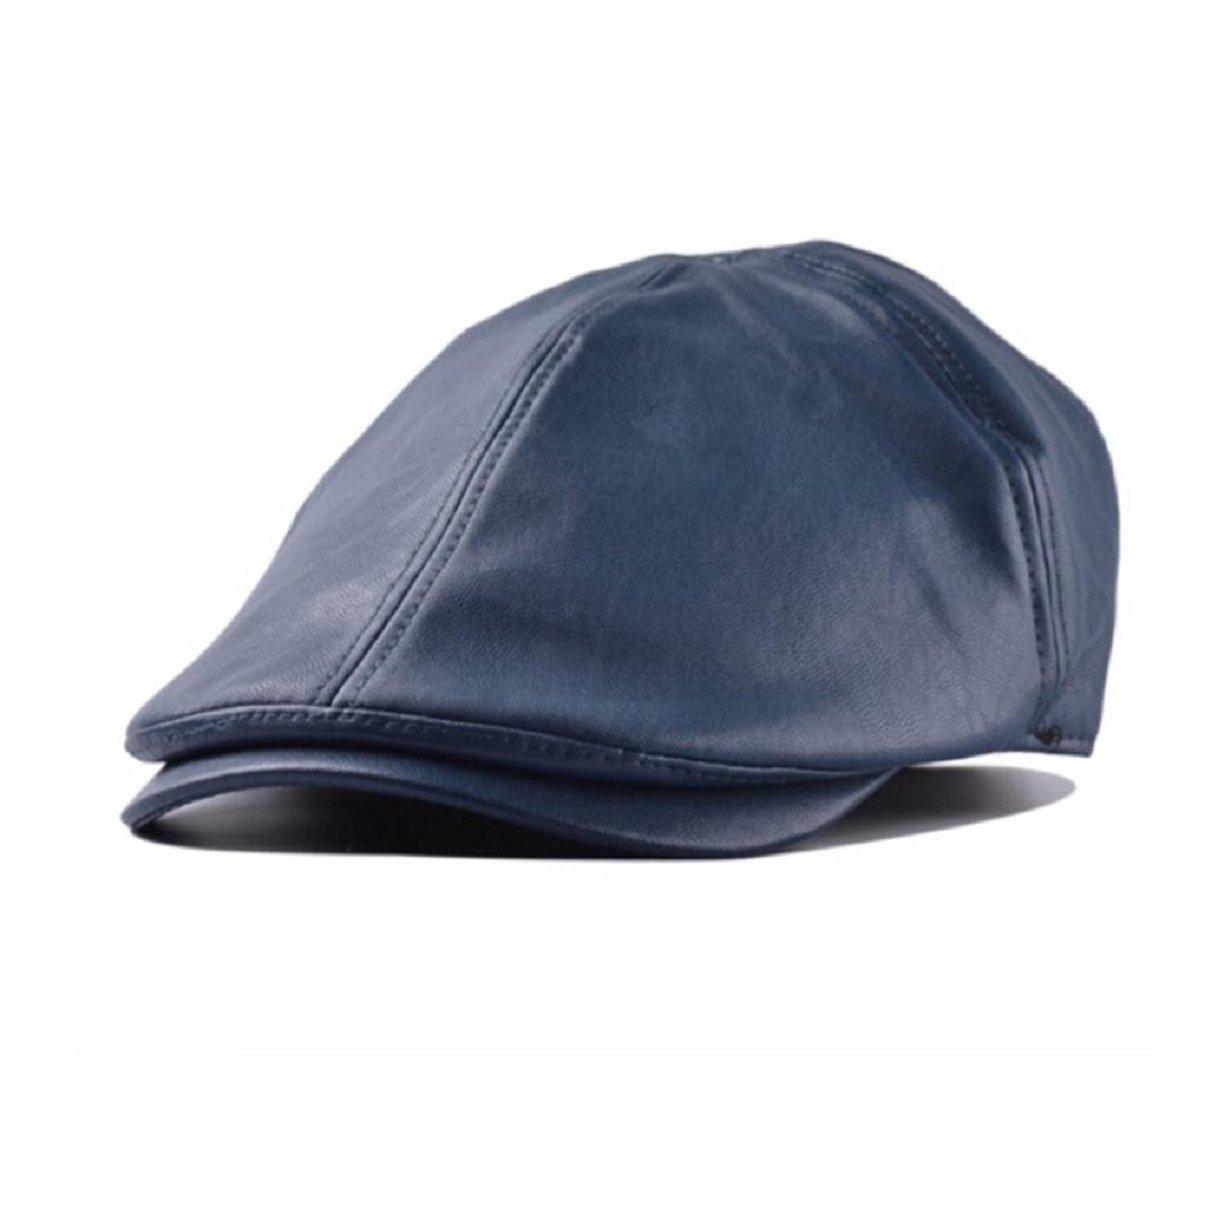 TONSEE Mens Women Vintage Leather Beret Cap Peaked Hat Newsboy Hat